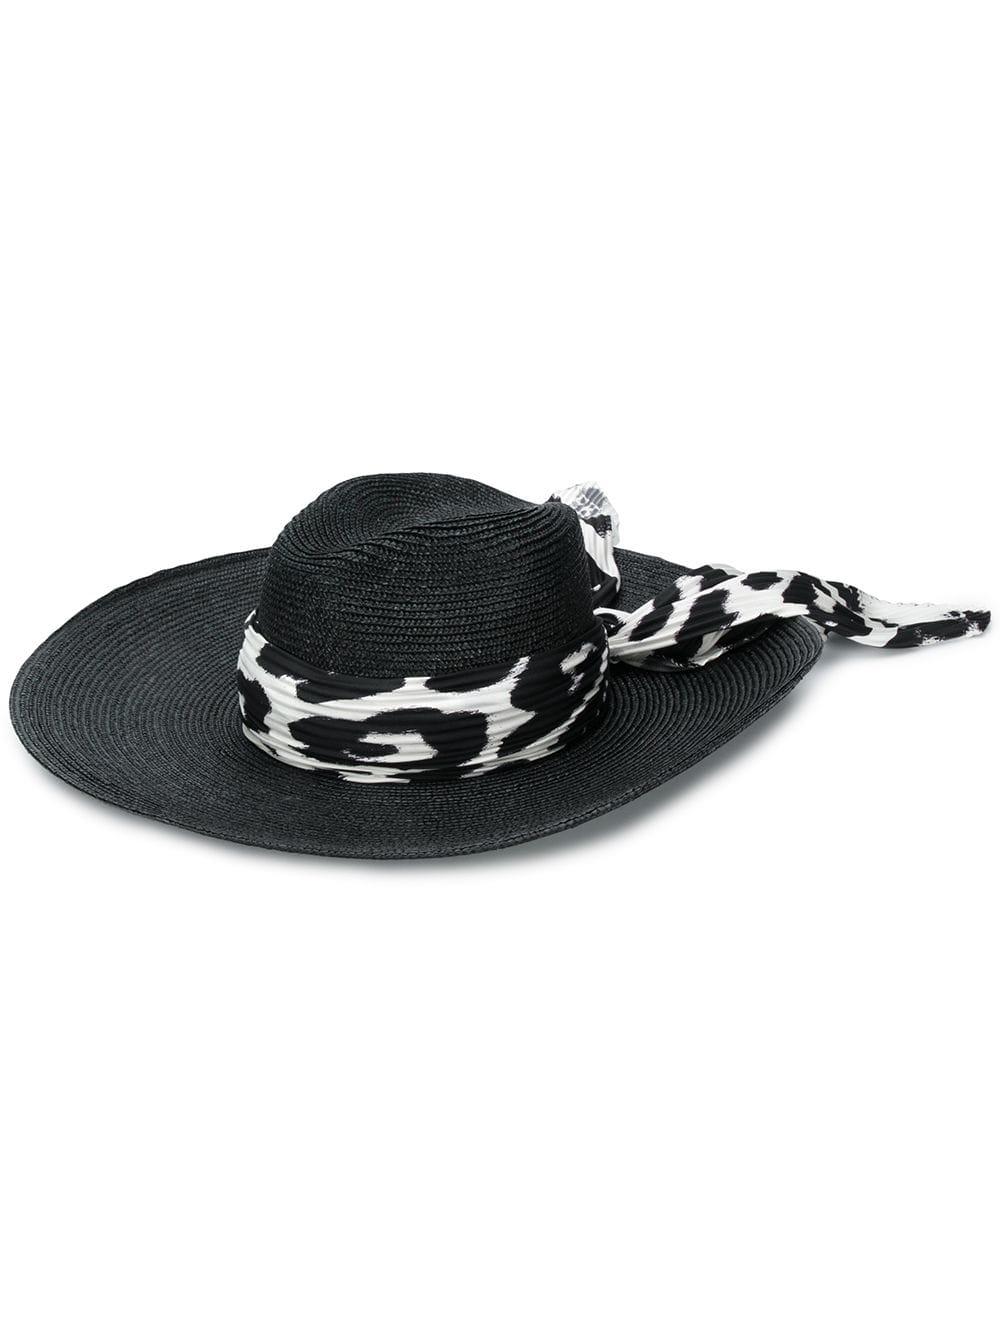 bf5b65f049bd6 Black Hat With Printed Foulard - ERMANNO SCERVINO - Russocapri